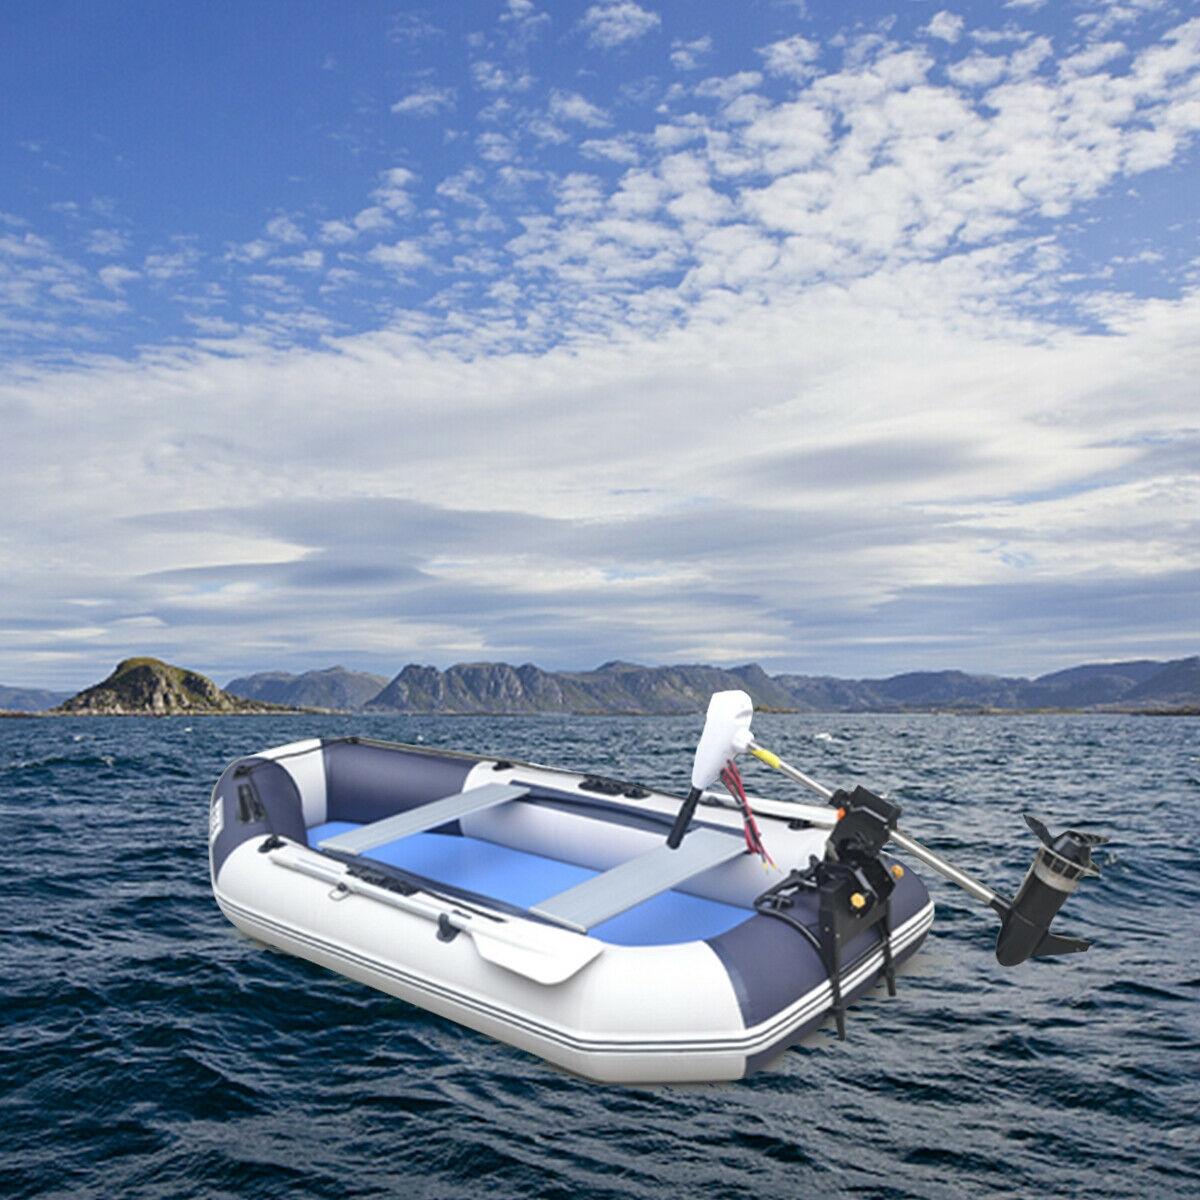 Mount Kit Outboard Motor Bracket For Fishing Boat